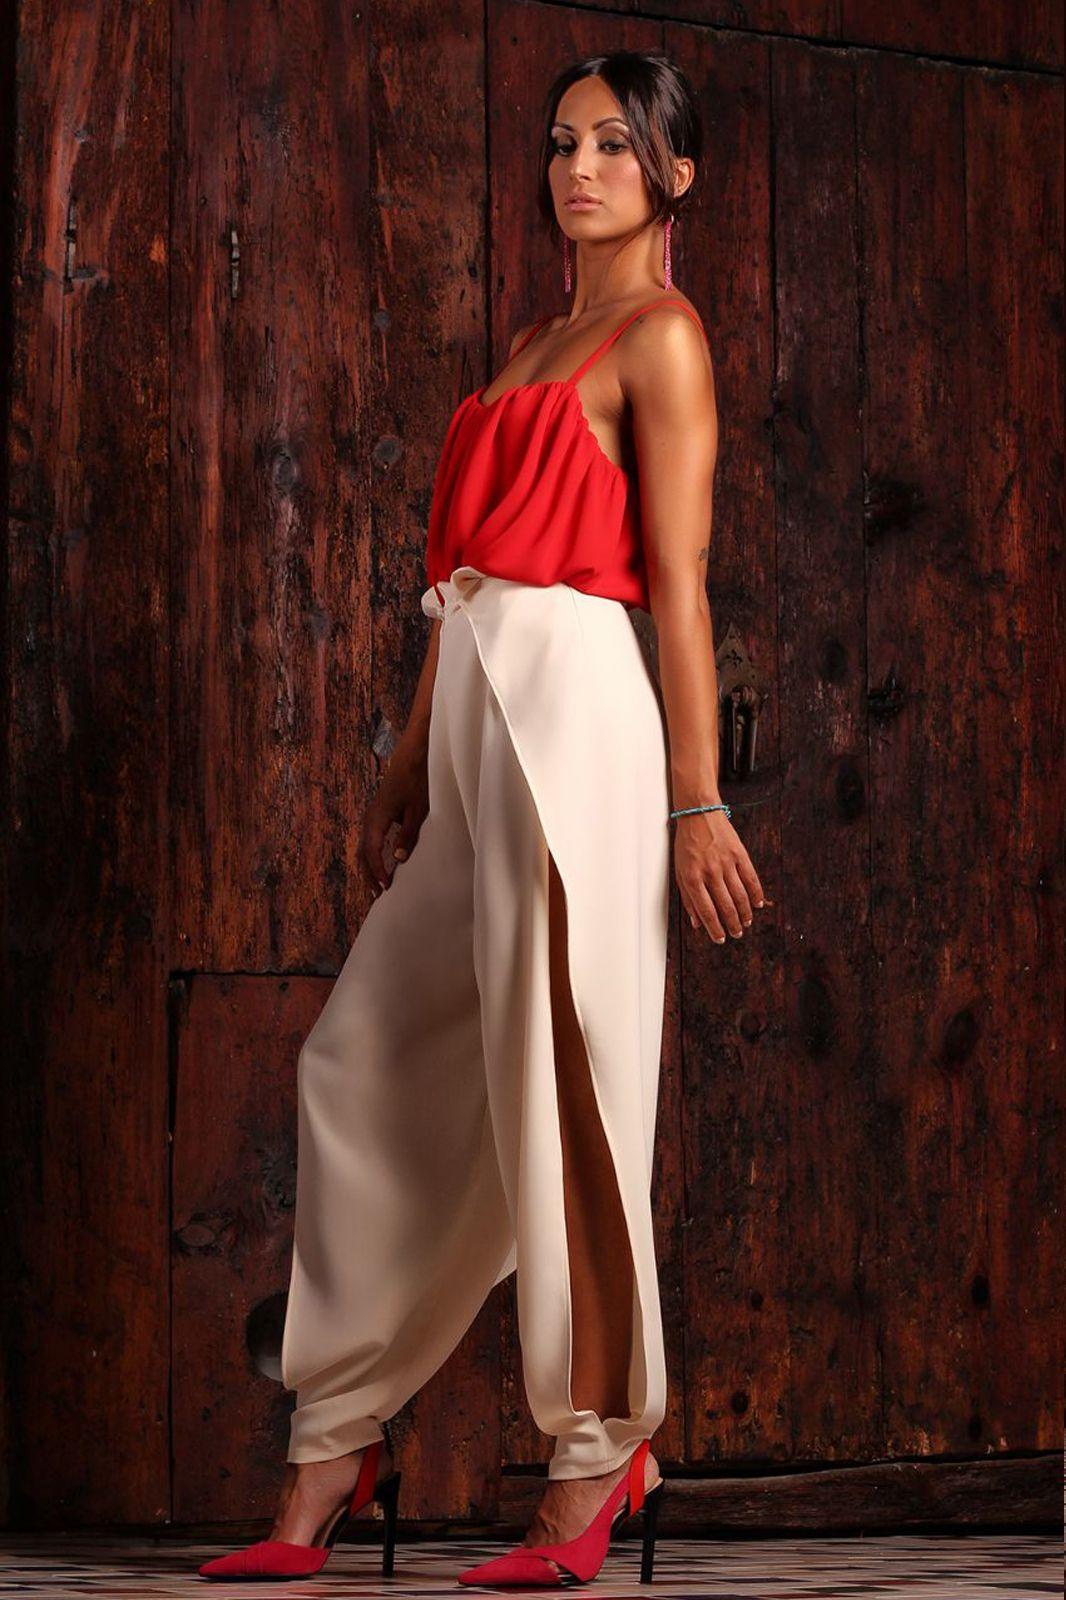 Pantalon Largo Abierto Para Chica Pantalon Fiesta Diseno Moda Mujer Pantalones De Fiesta Moda Para Mujer Moda